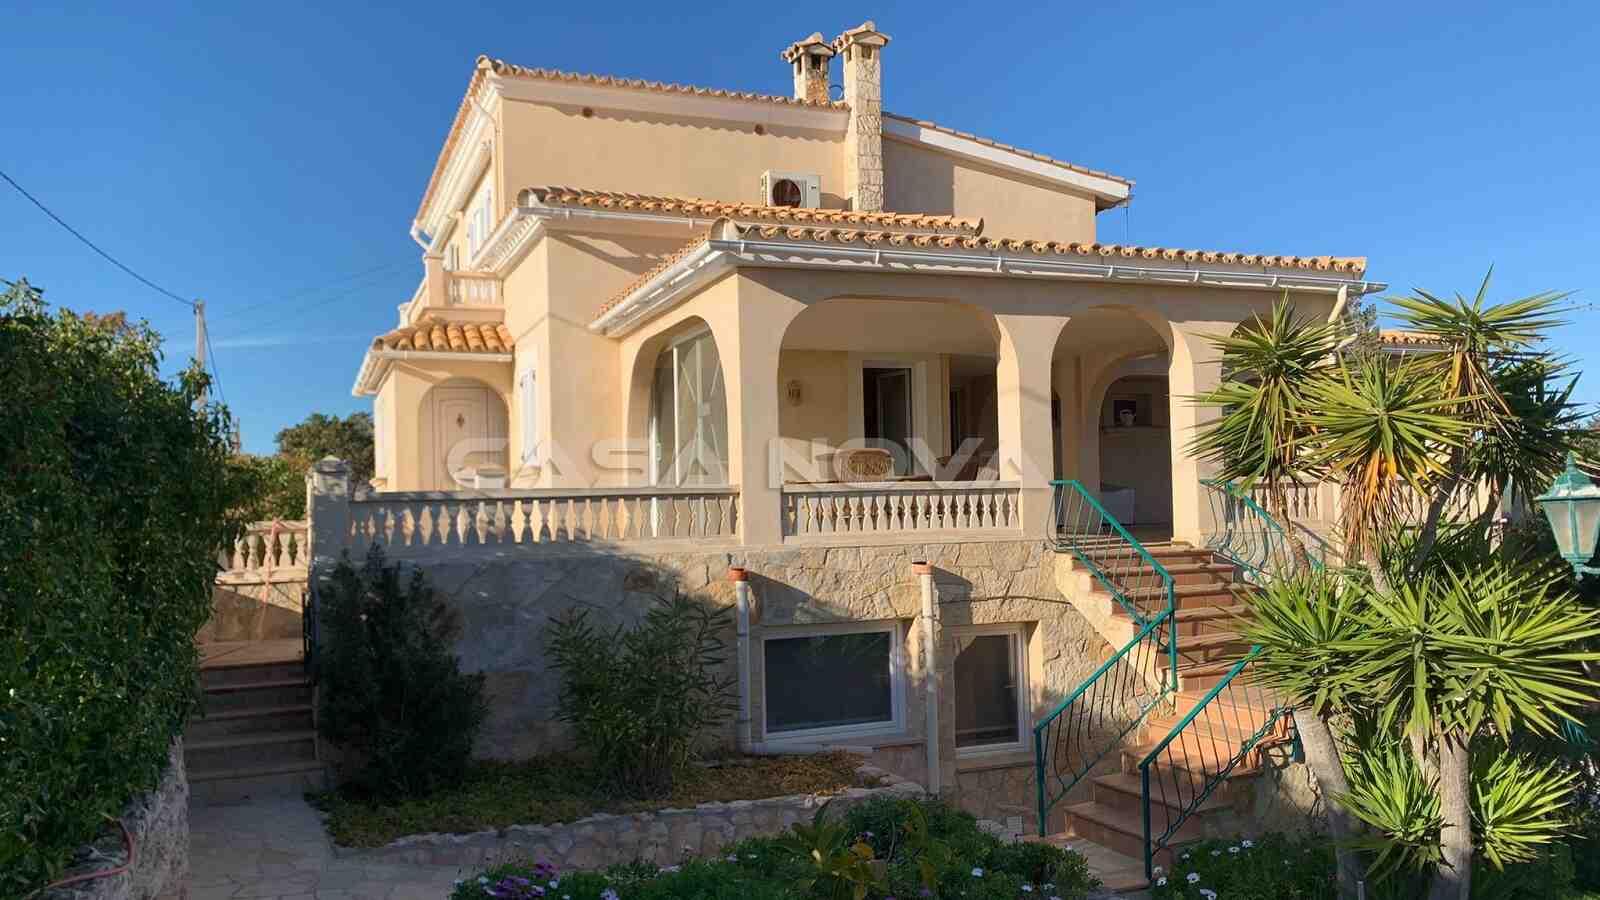 Mallorca Villa mit separatem Grundstück im mediterranem Stil